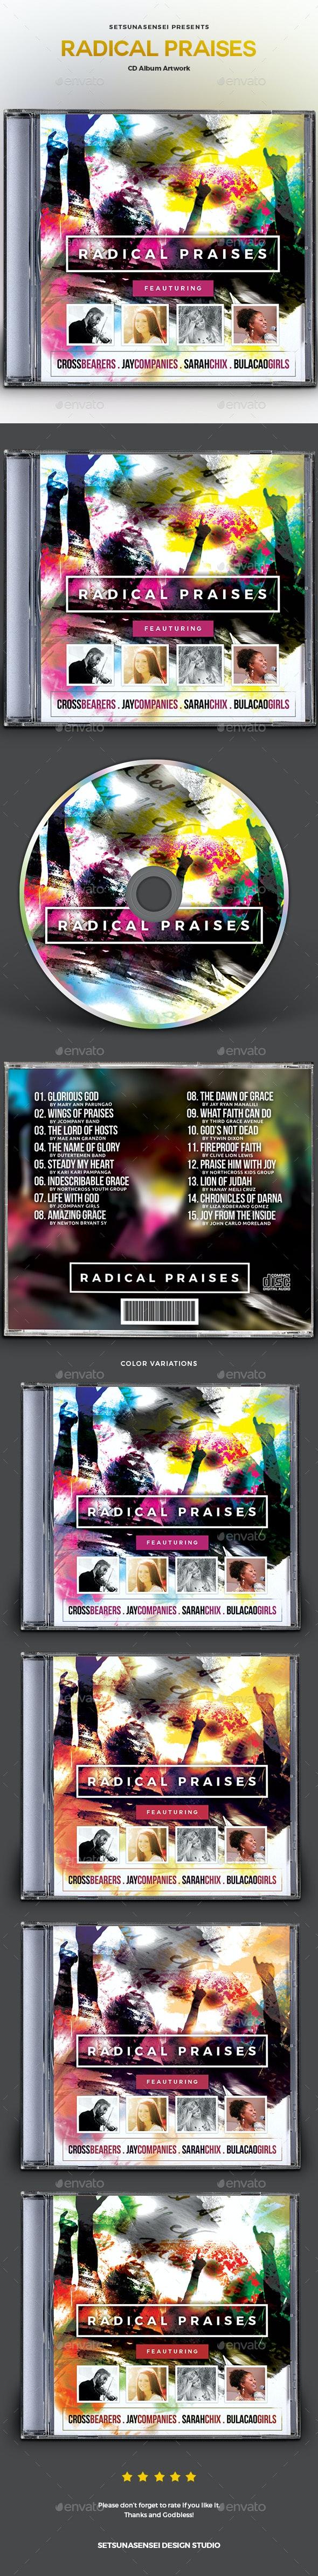 Radical Praises CD Album Artwork - CD & DVD Artwork Print Templates